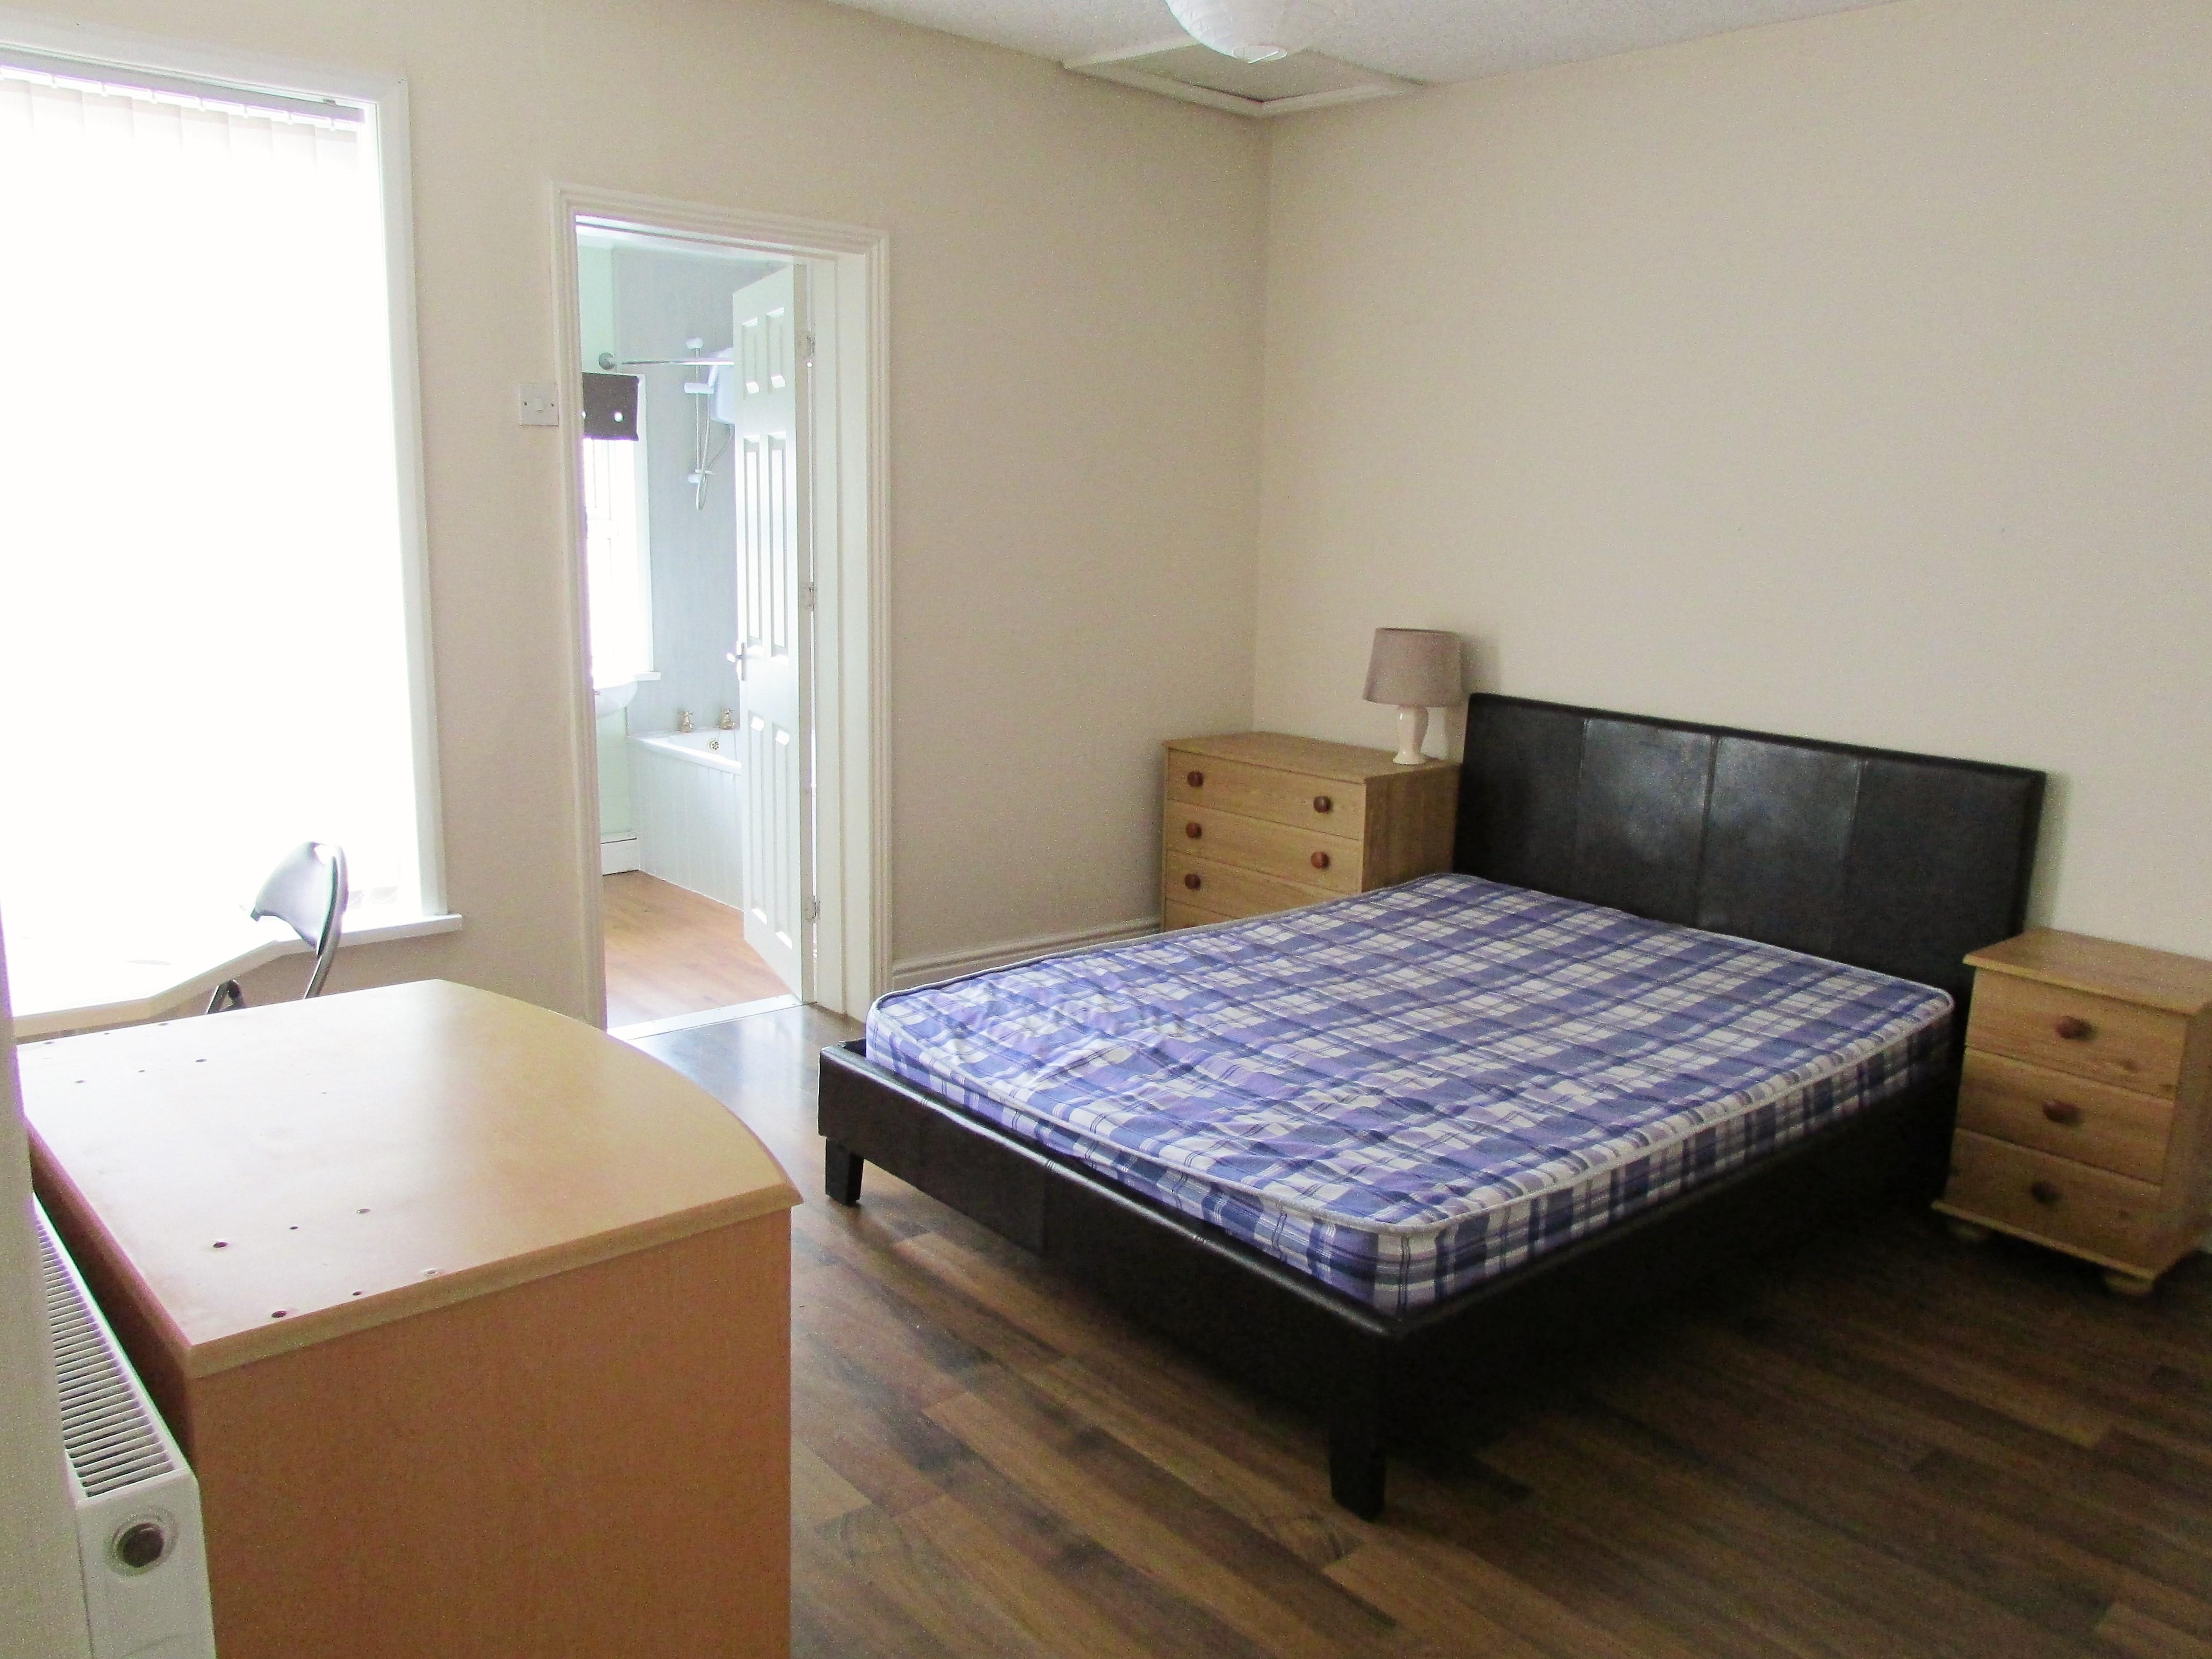 3 x En-suite Rooms 2 mins from Crewe Station